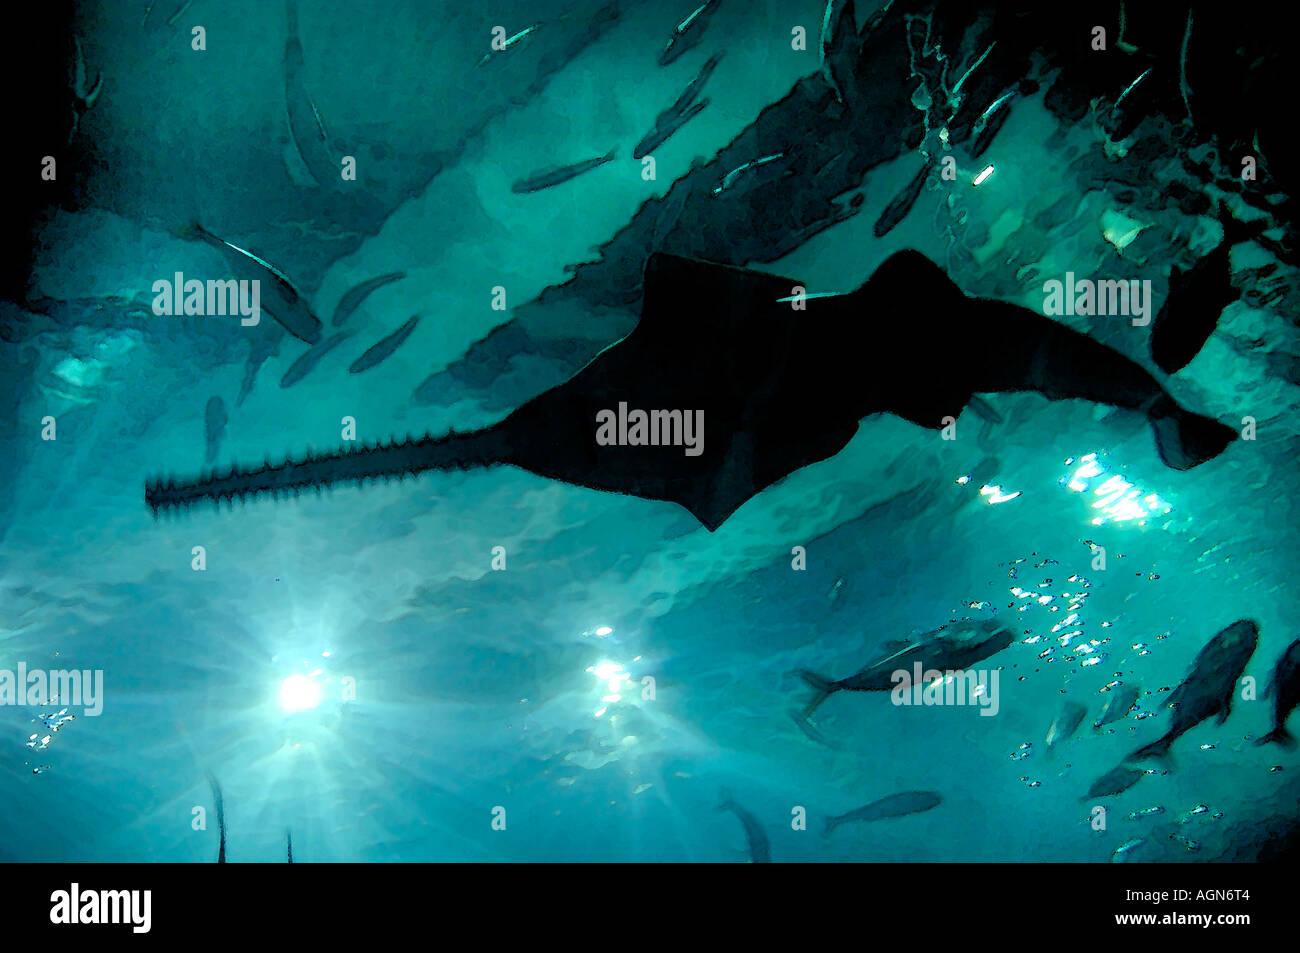 Sawfish: A Deep Sea Thriller